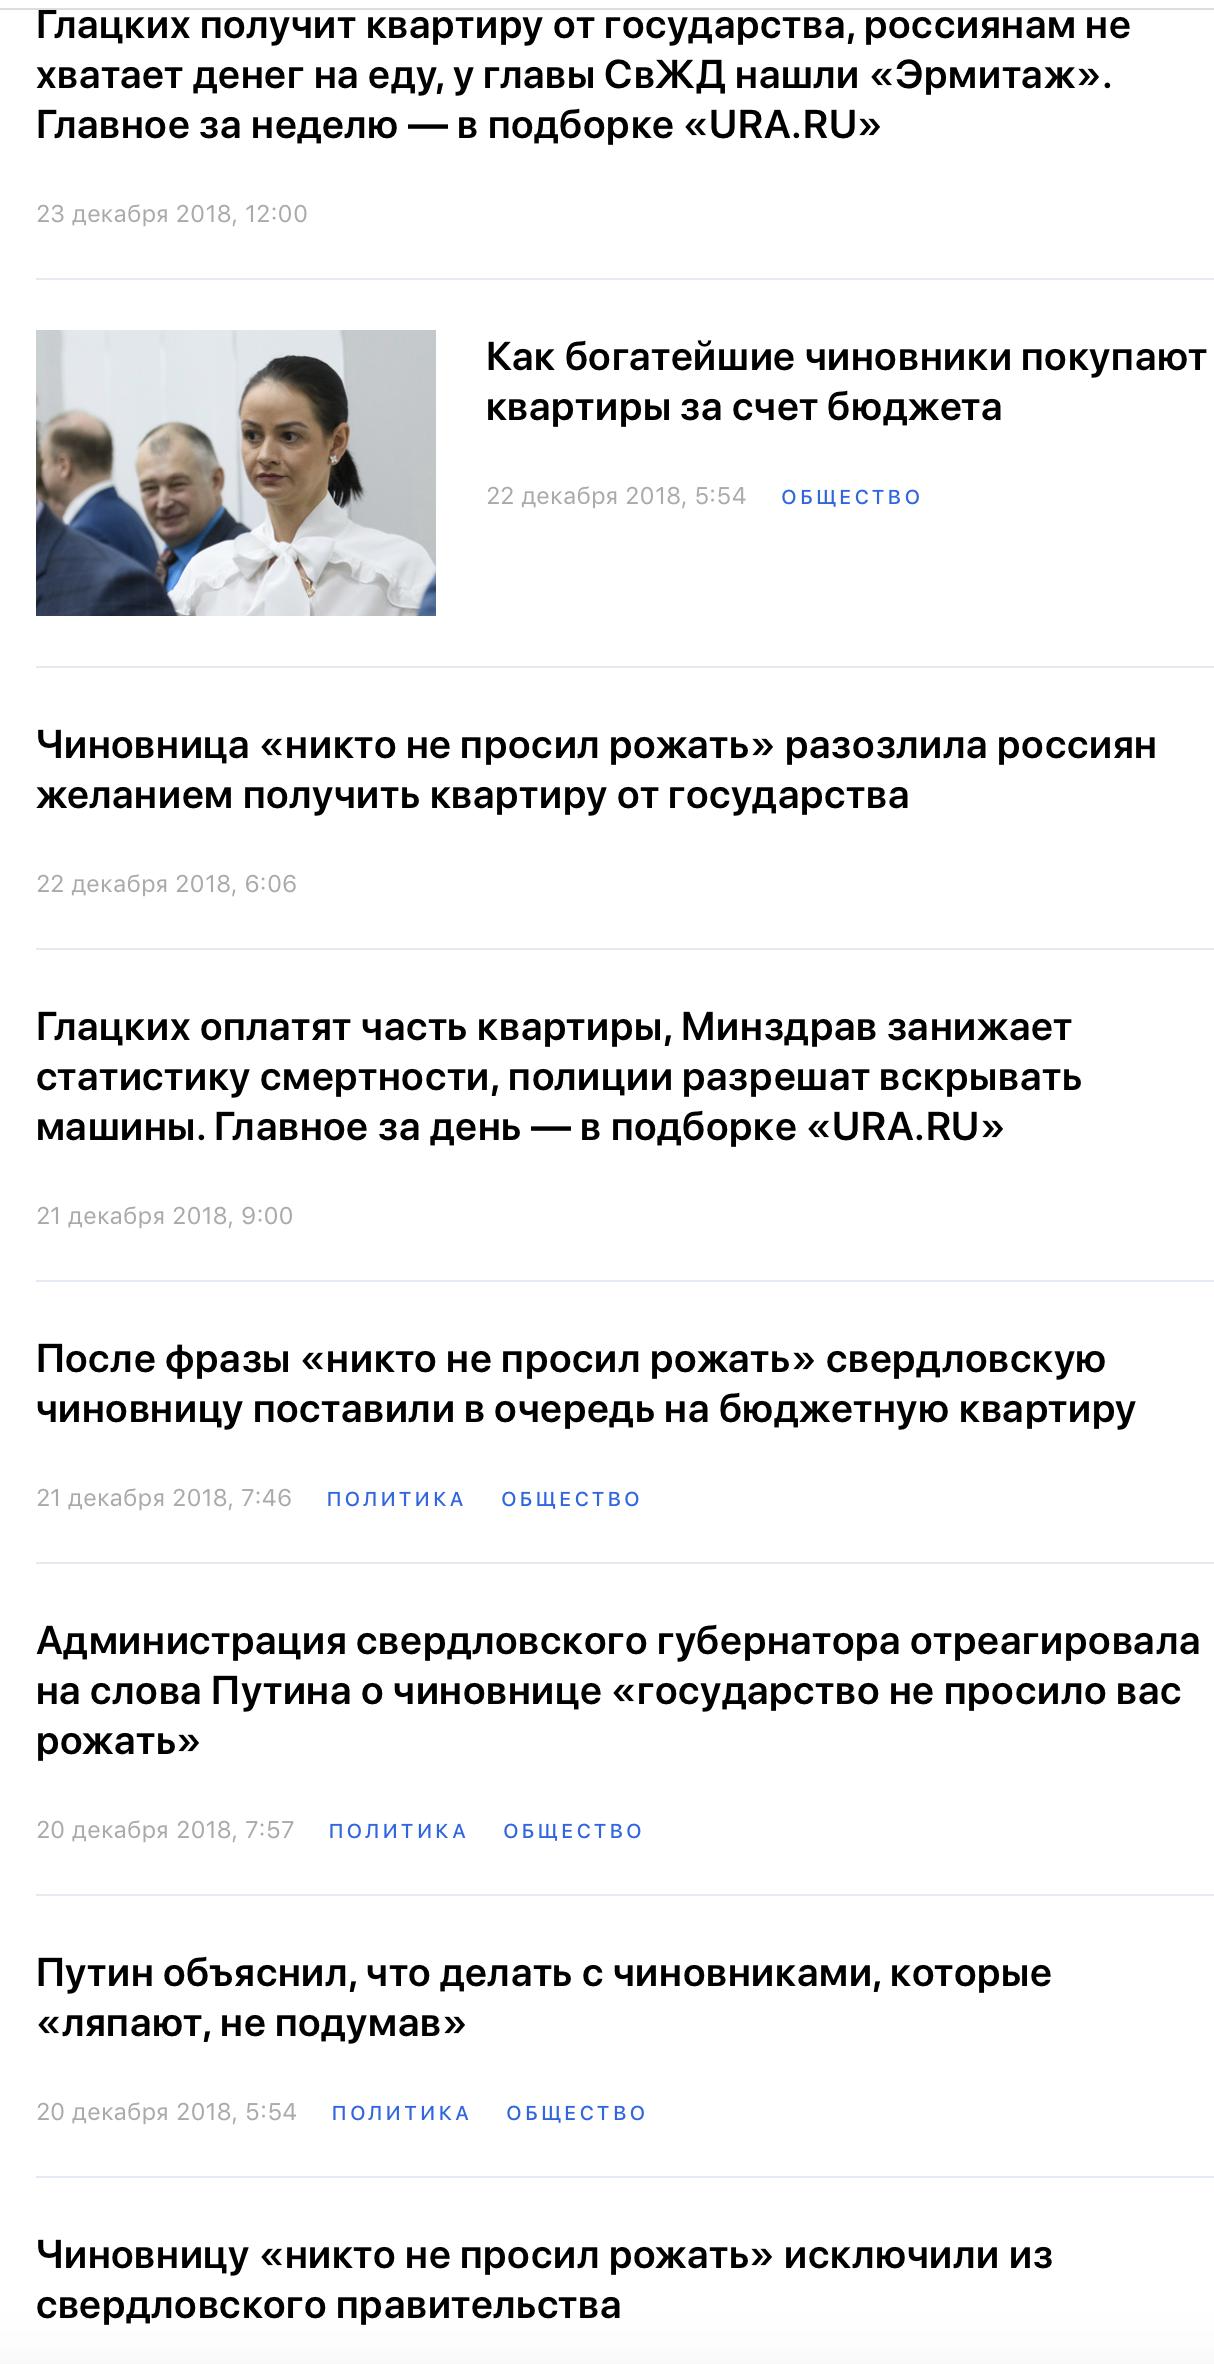 Глацких Ольга Вячеславовна (Ольга Глацких)